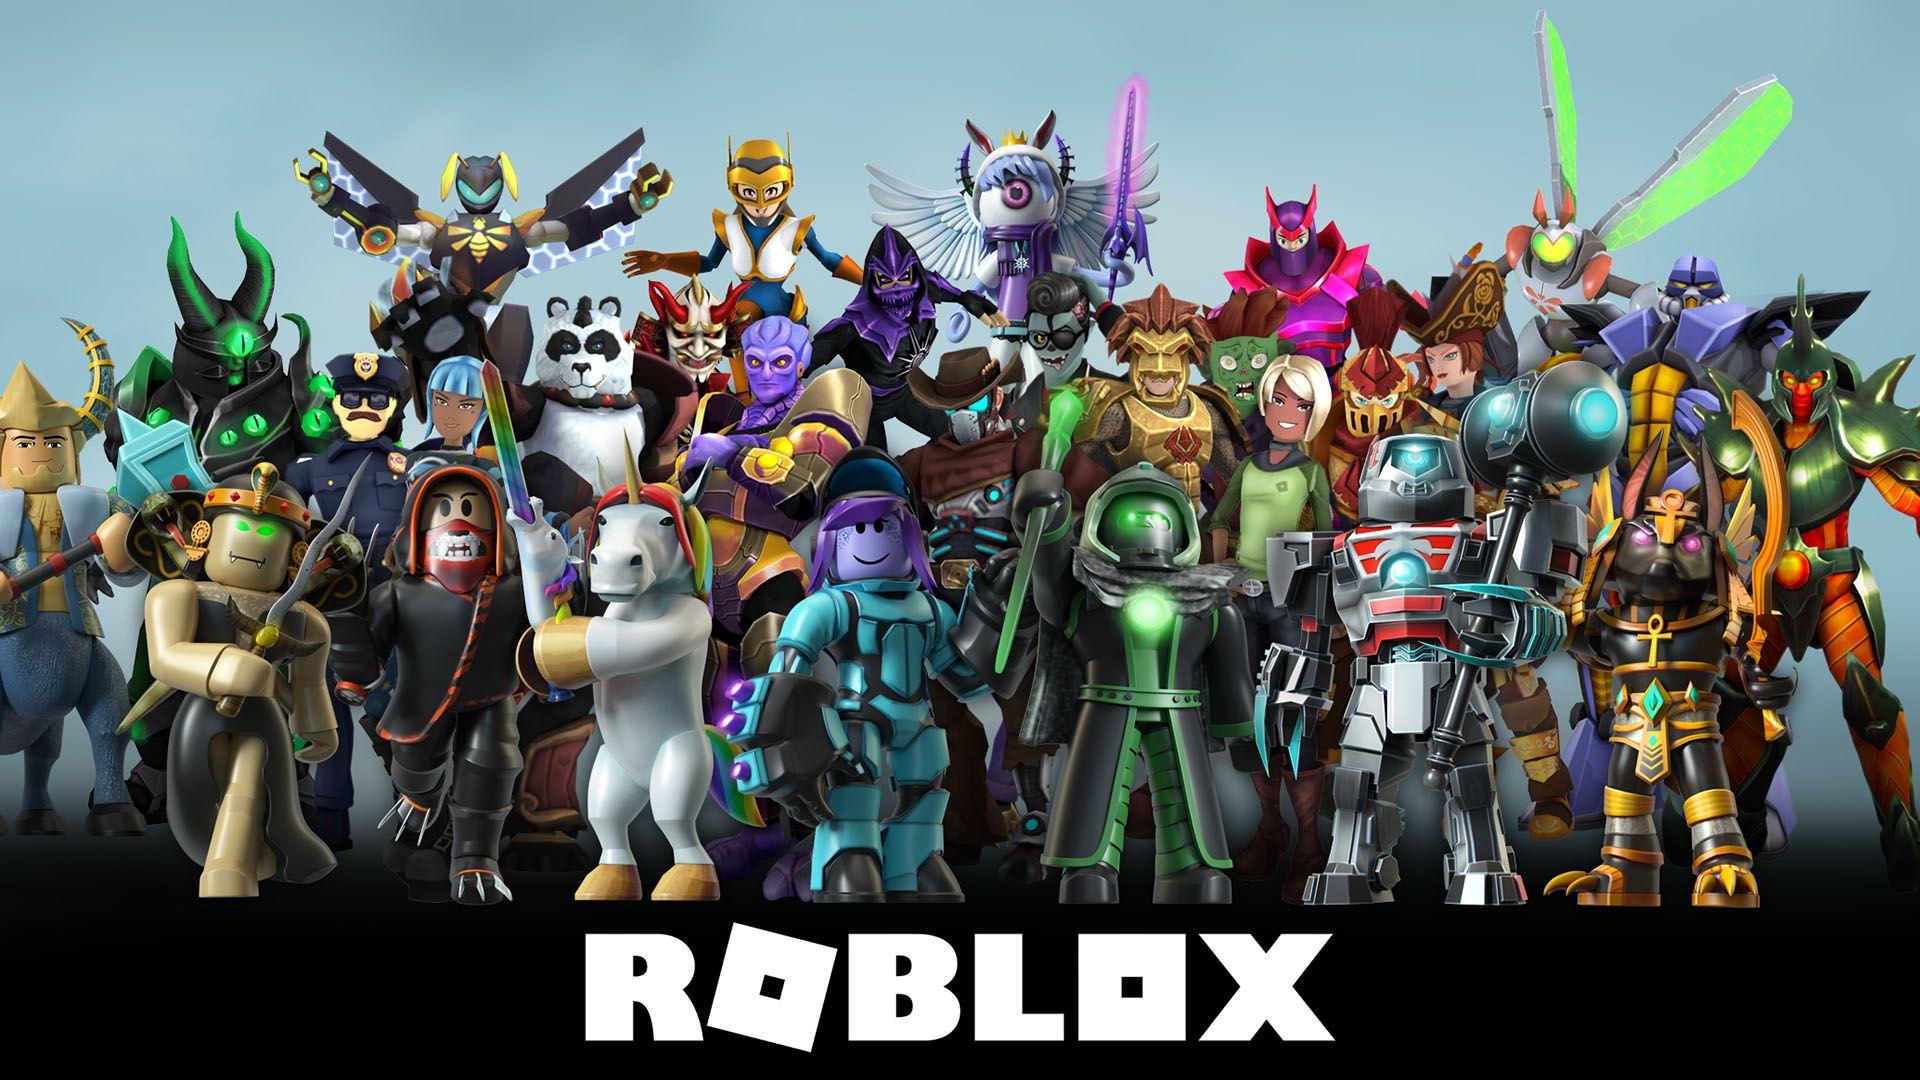 Wallpaper For Pc Roblox